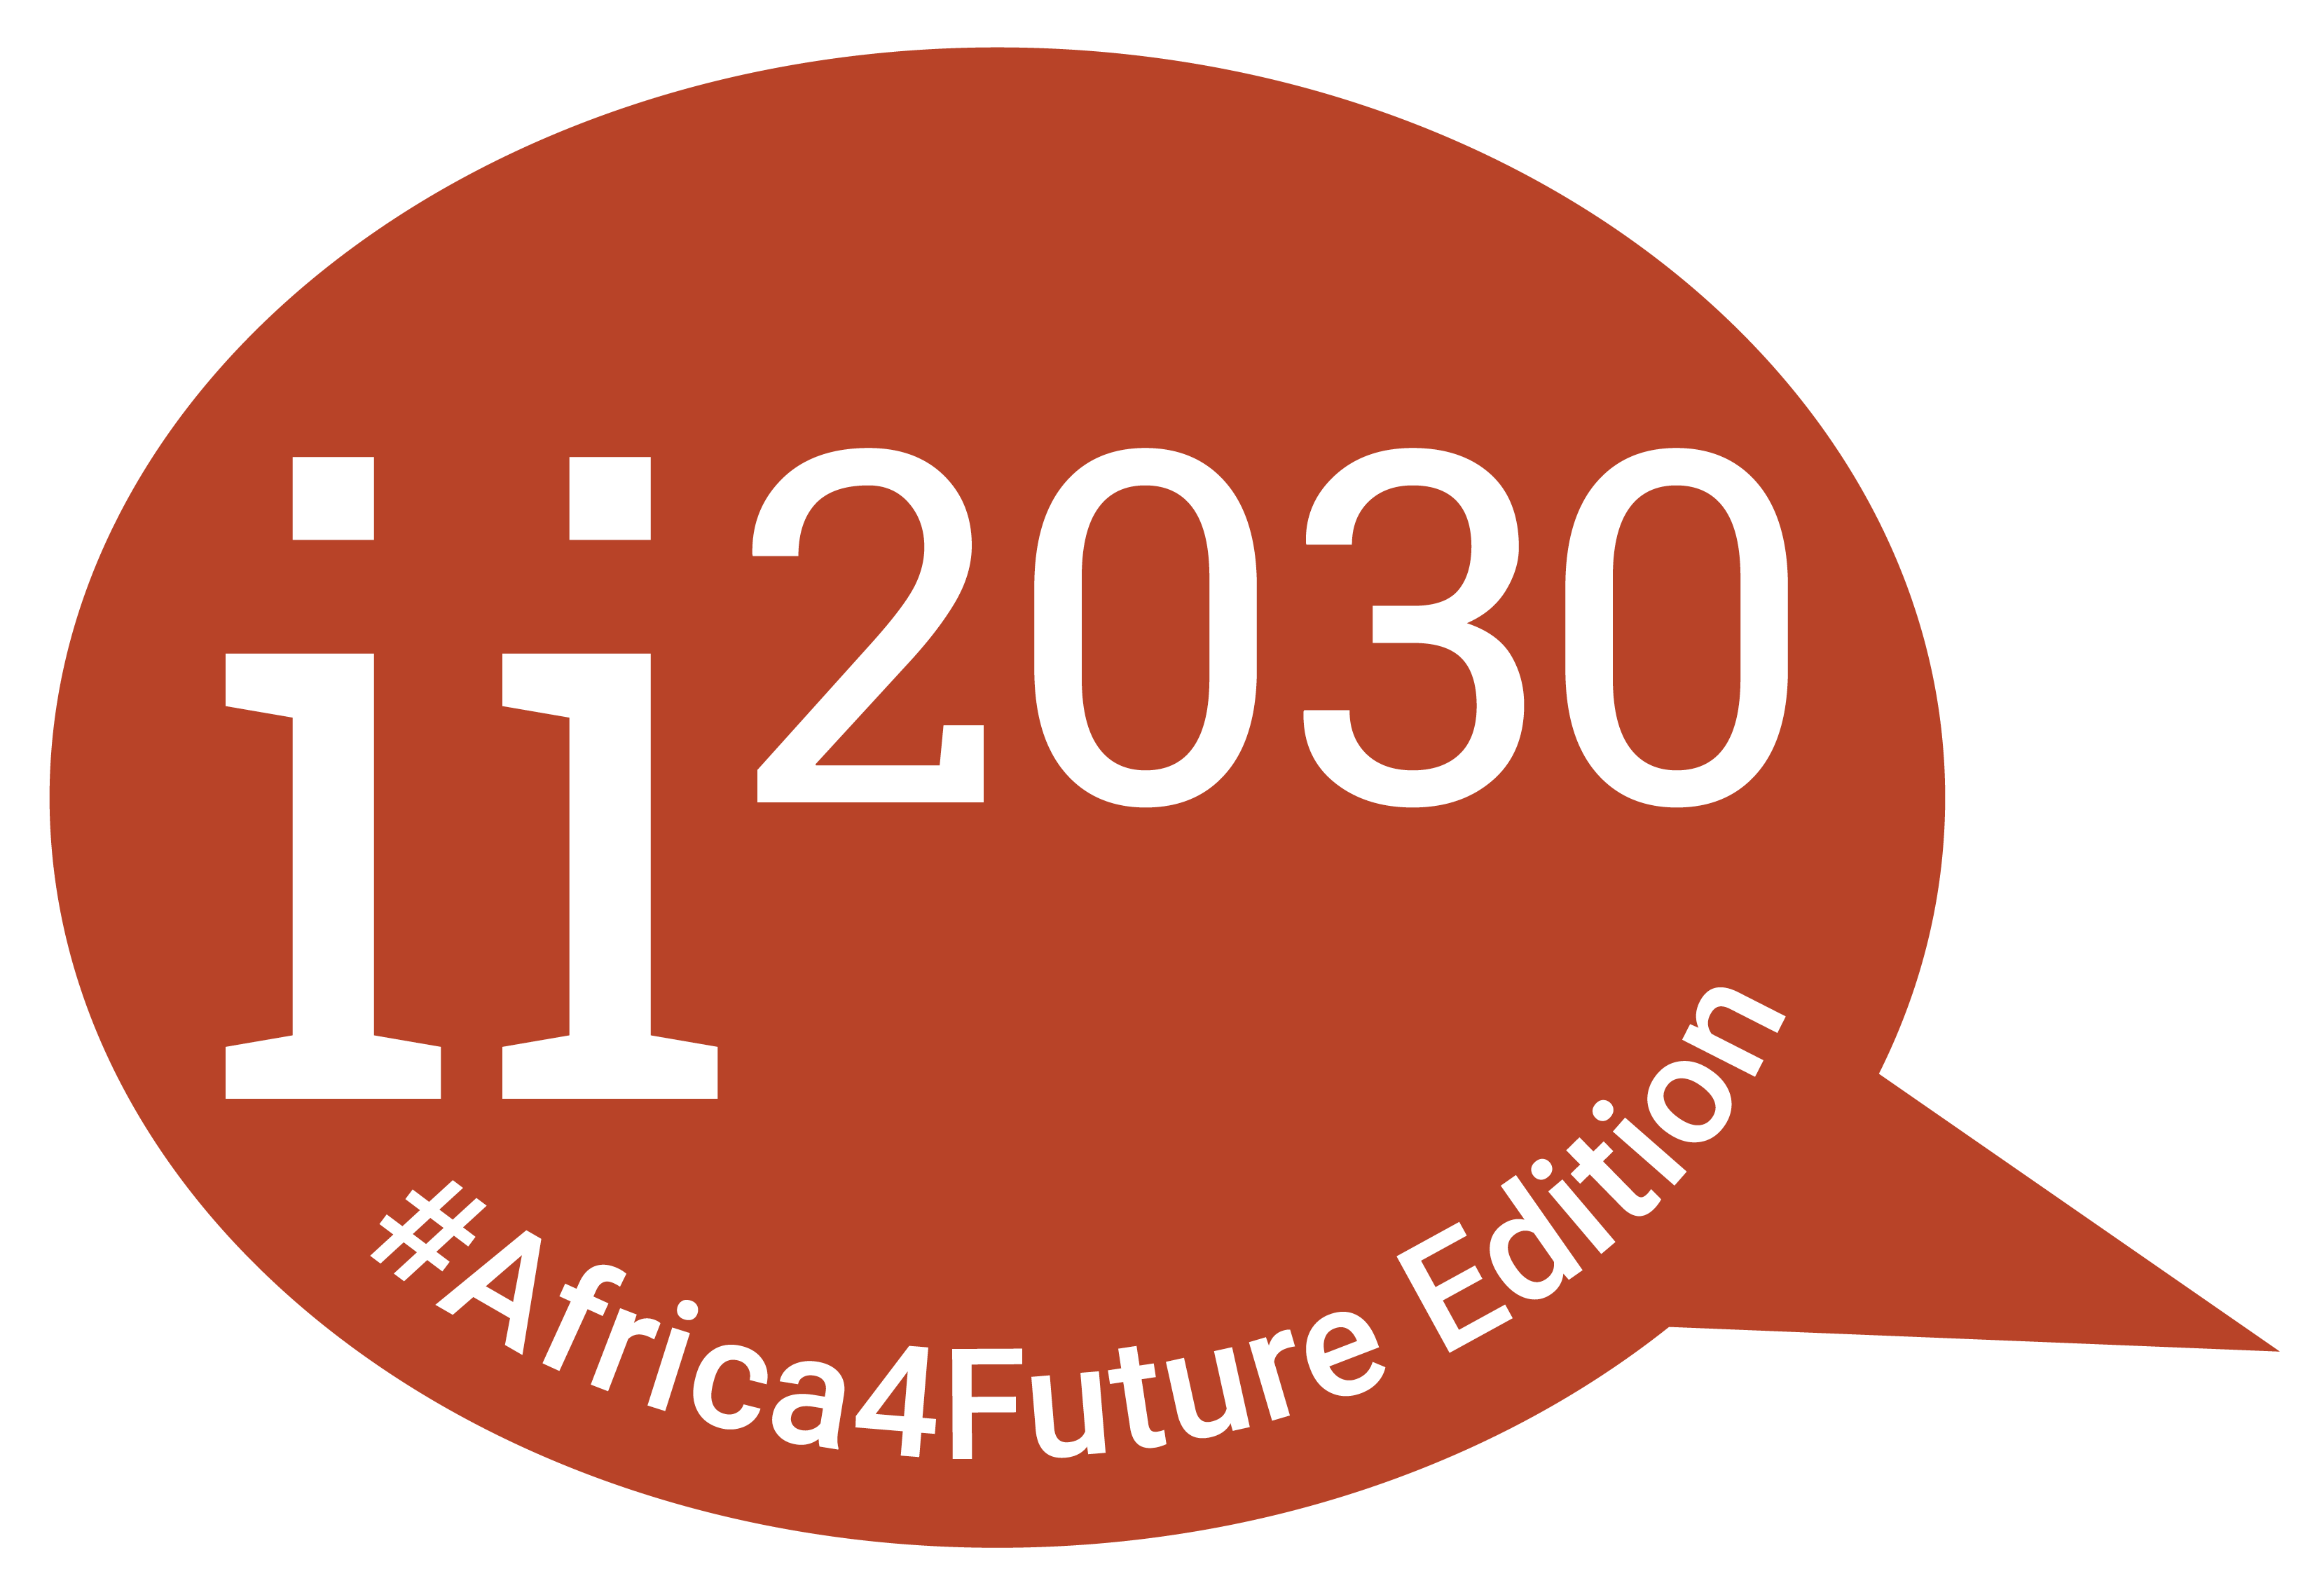 #Africa4Future edition